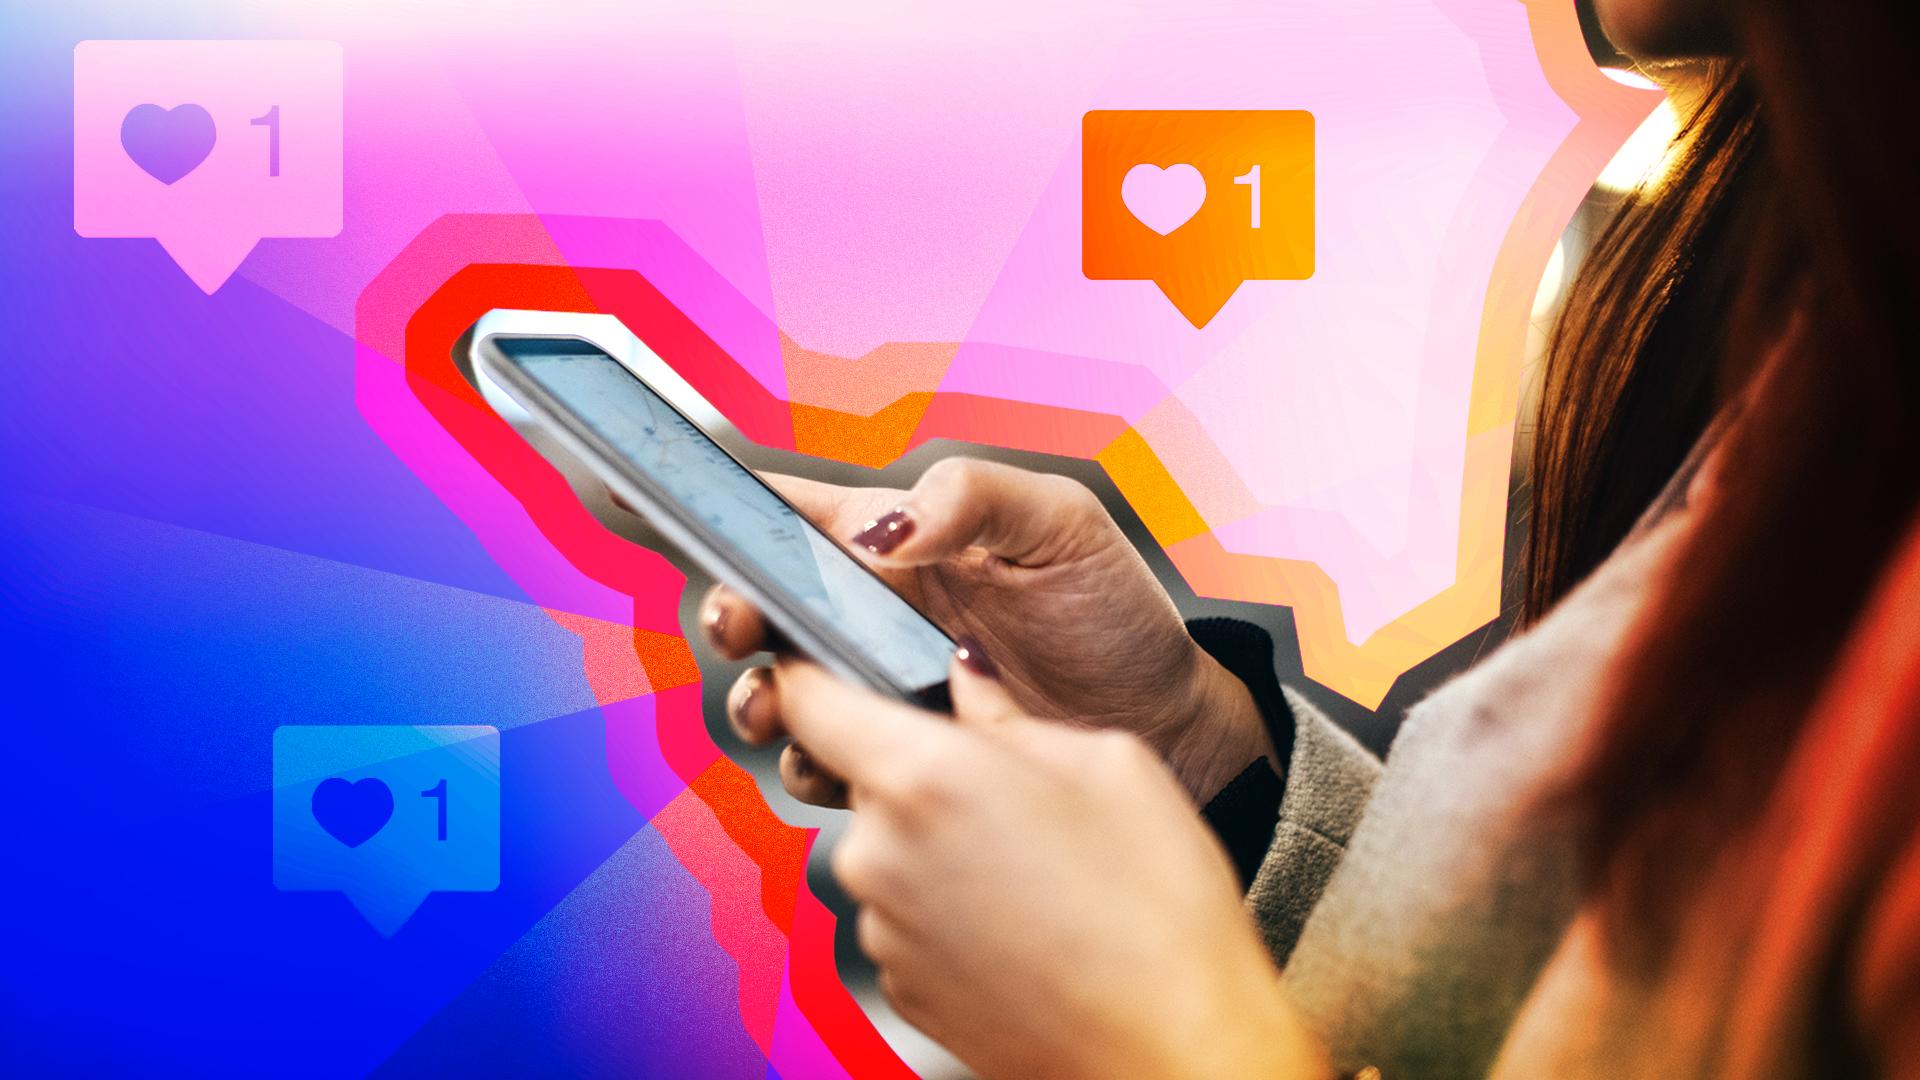 Social Media Diary: A Dancer, Comedian and Digital Creator with 699k Followers